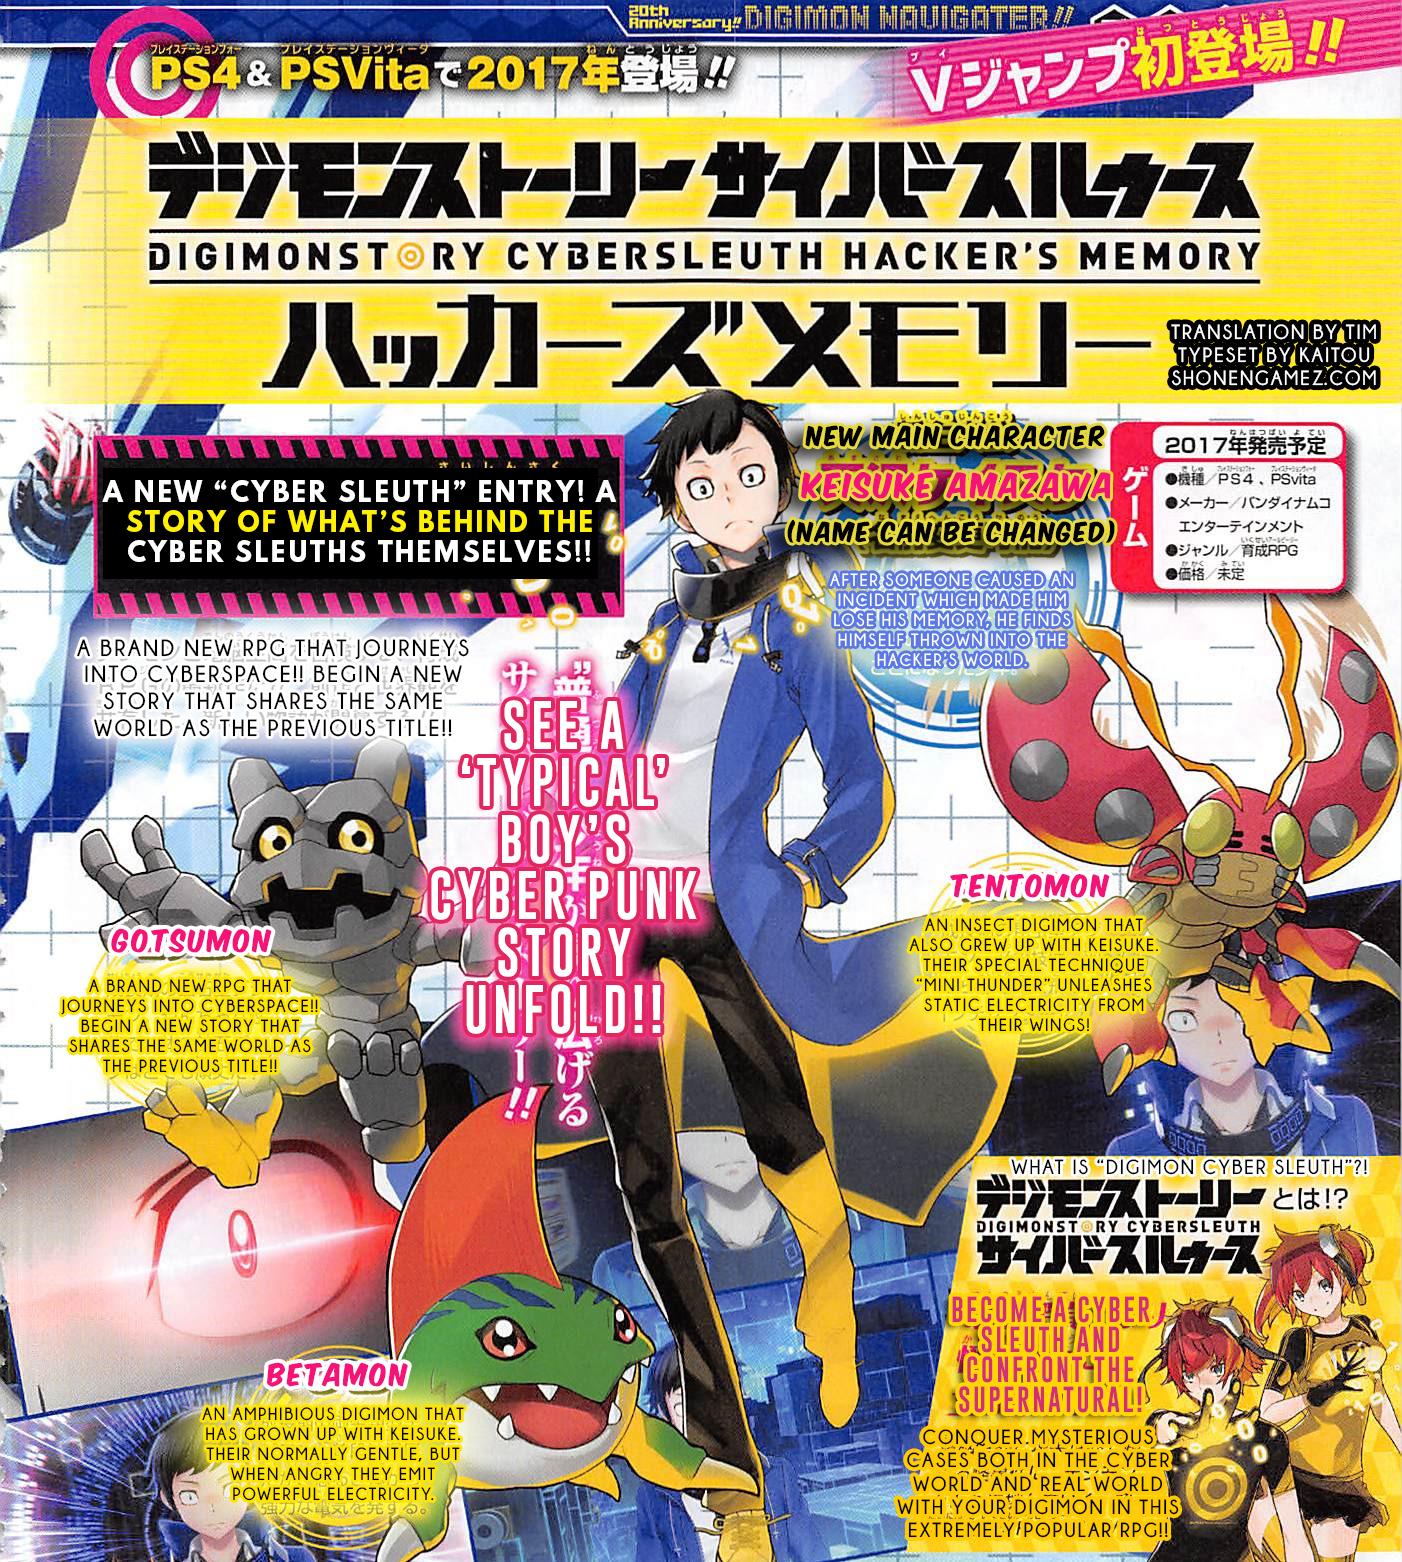 Digimon Story: Cyber Sleuth - Hacker's Memory Fd64328d3c3782f63e6f9e71ecdf63c2a7b7e1411f6efa5854e64a80144548fc